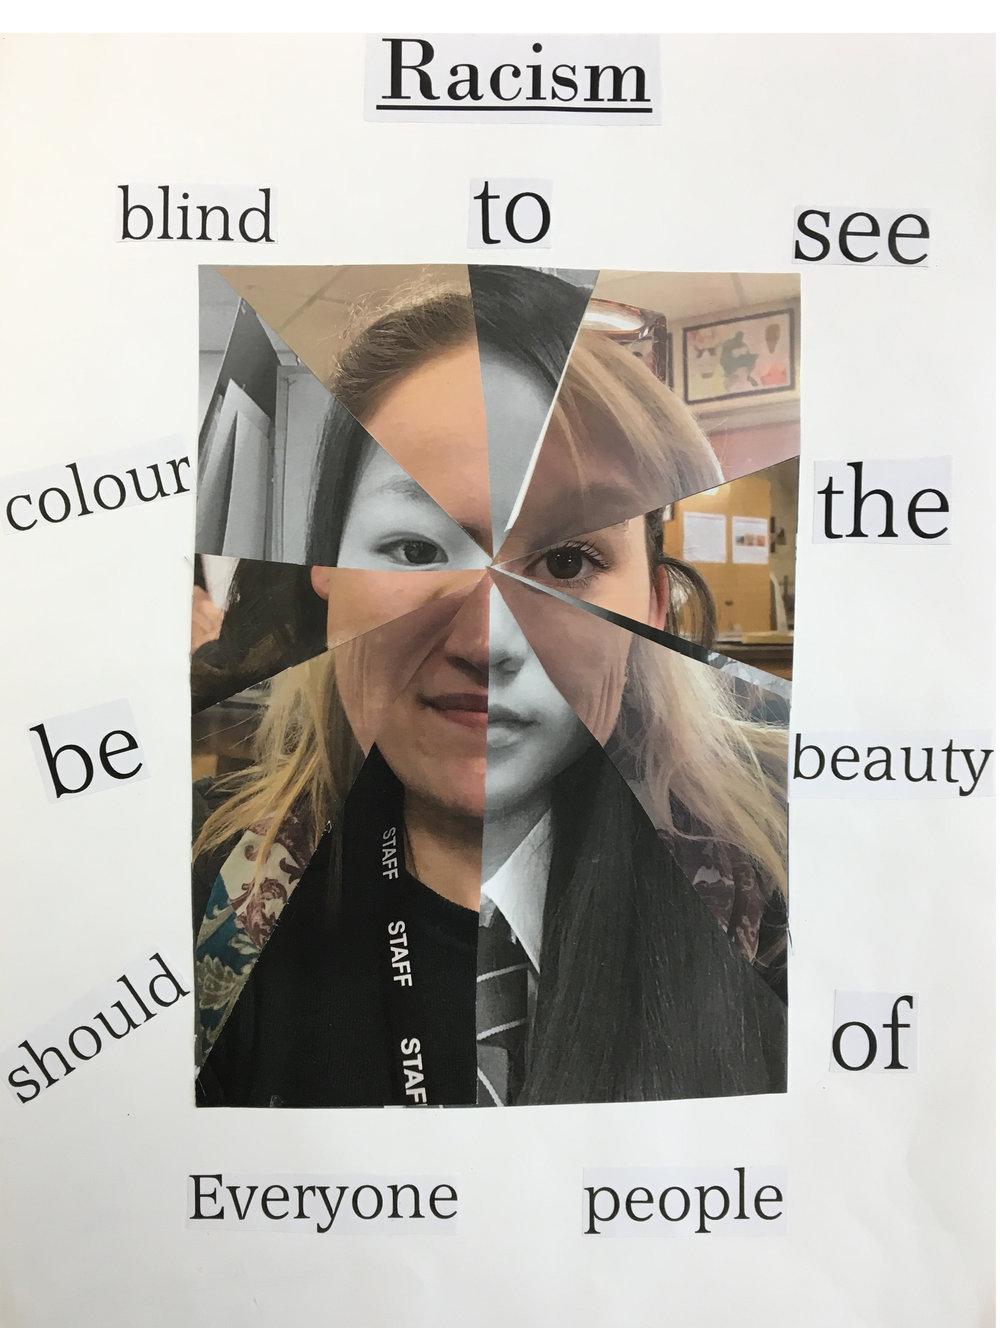 Risa Watanabe - Crickhowell High School - Powys - Special Category (Anti-Racism Advert)